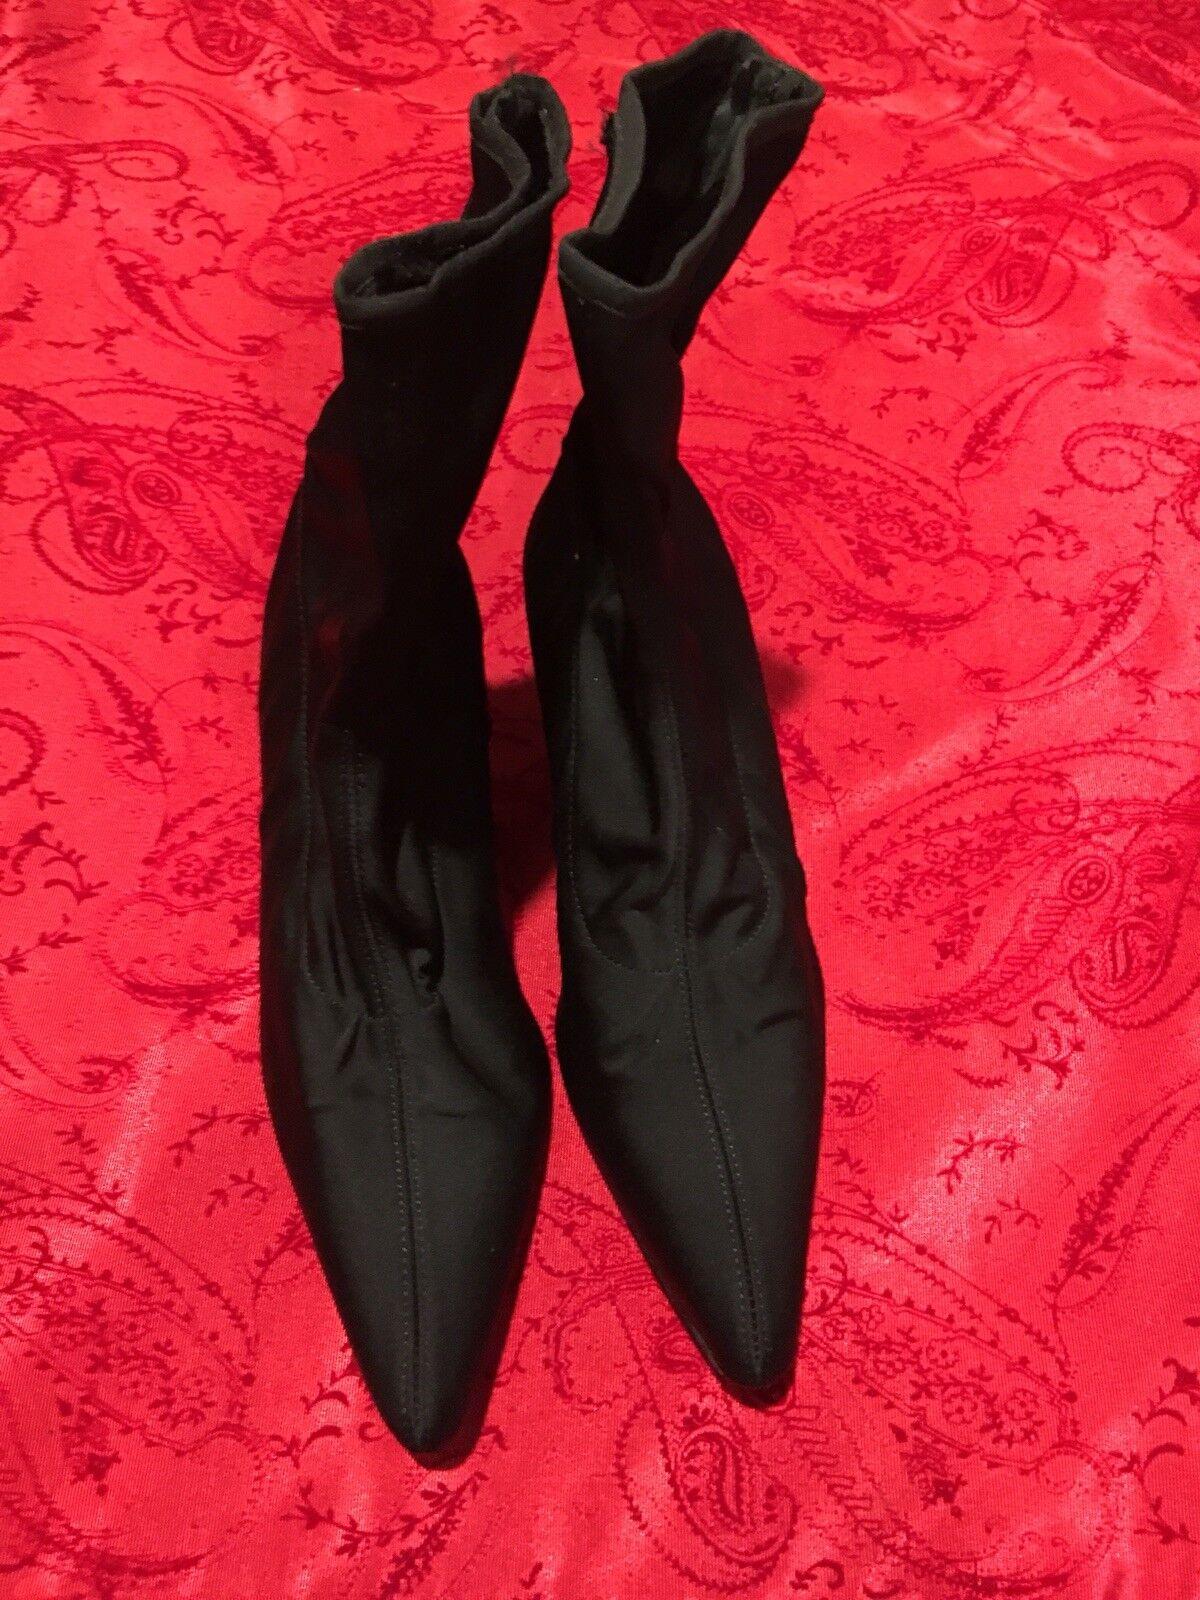 Damenschuhe DOLCE & GABBANA BLACK PULL-ON/ BOOTS SIZE 36 1/2